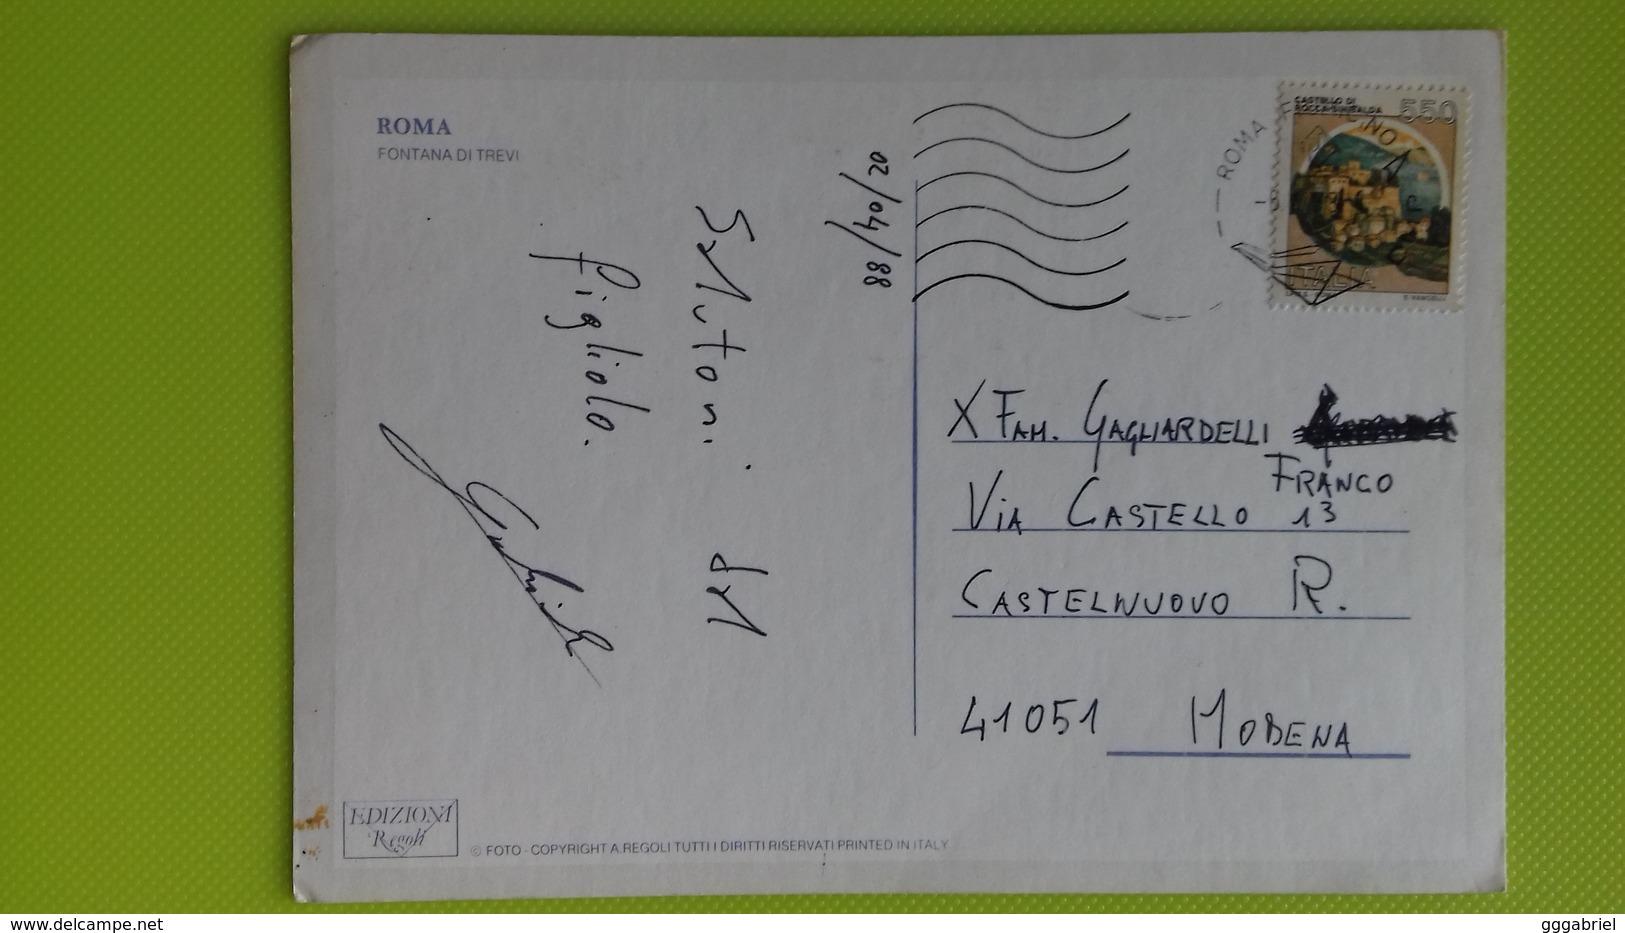 Cartolina ROMA - RM - Viaggiata - Postcard - Fontana Di Trevi - Fontana Di Trevi